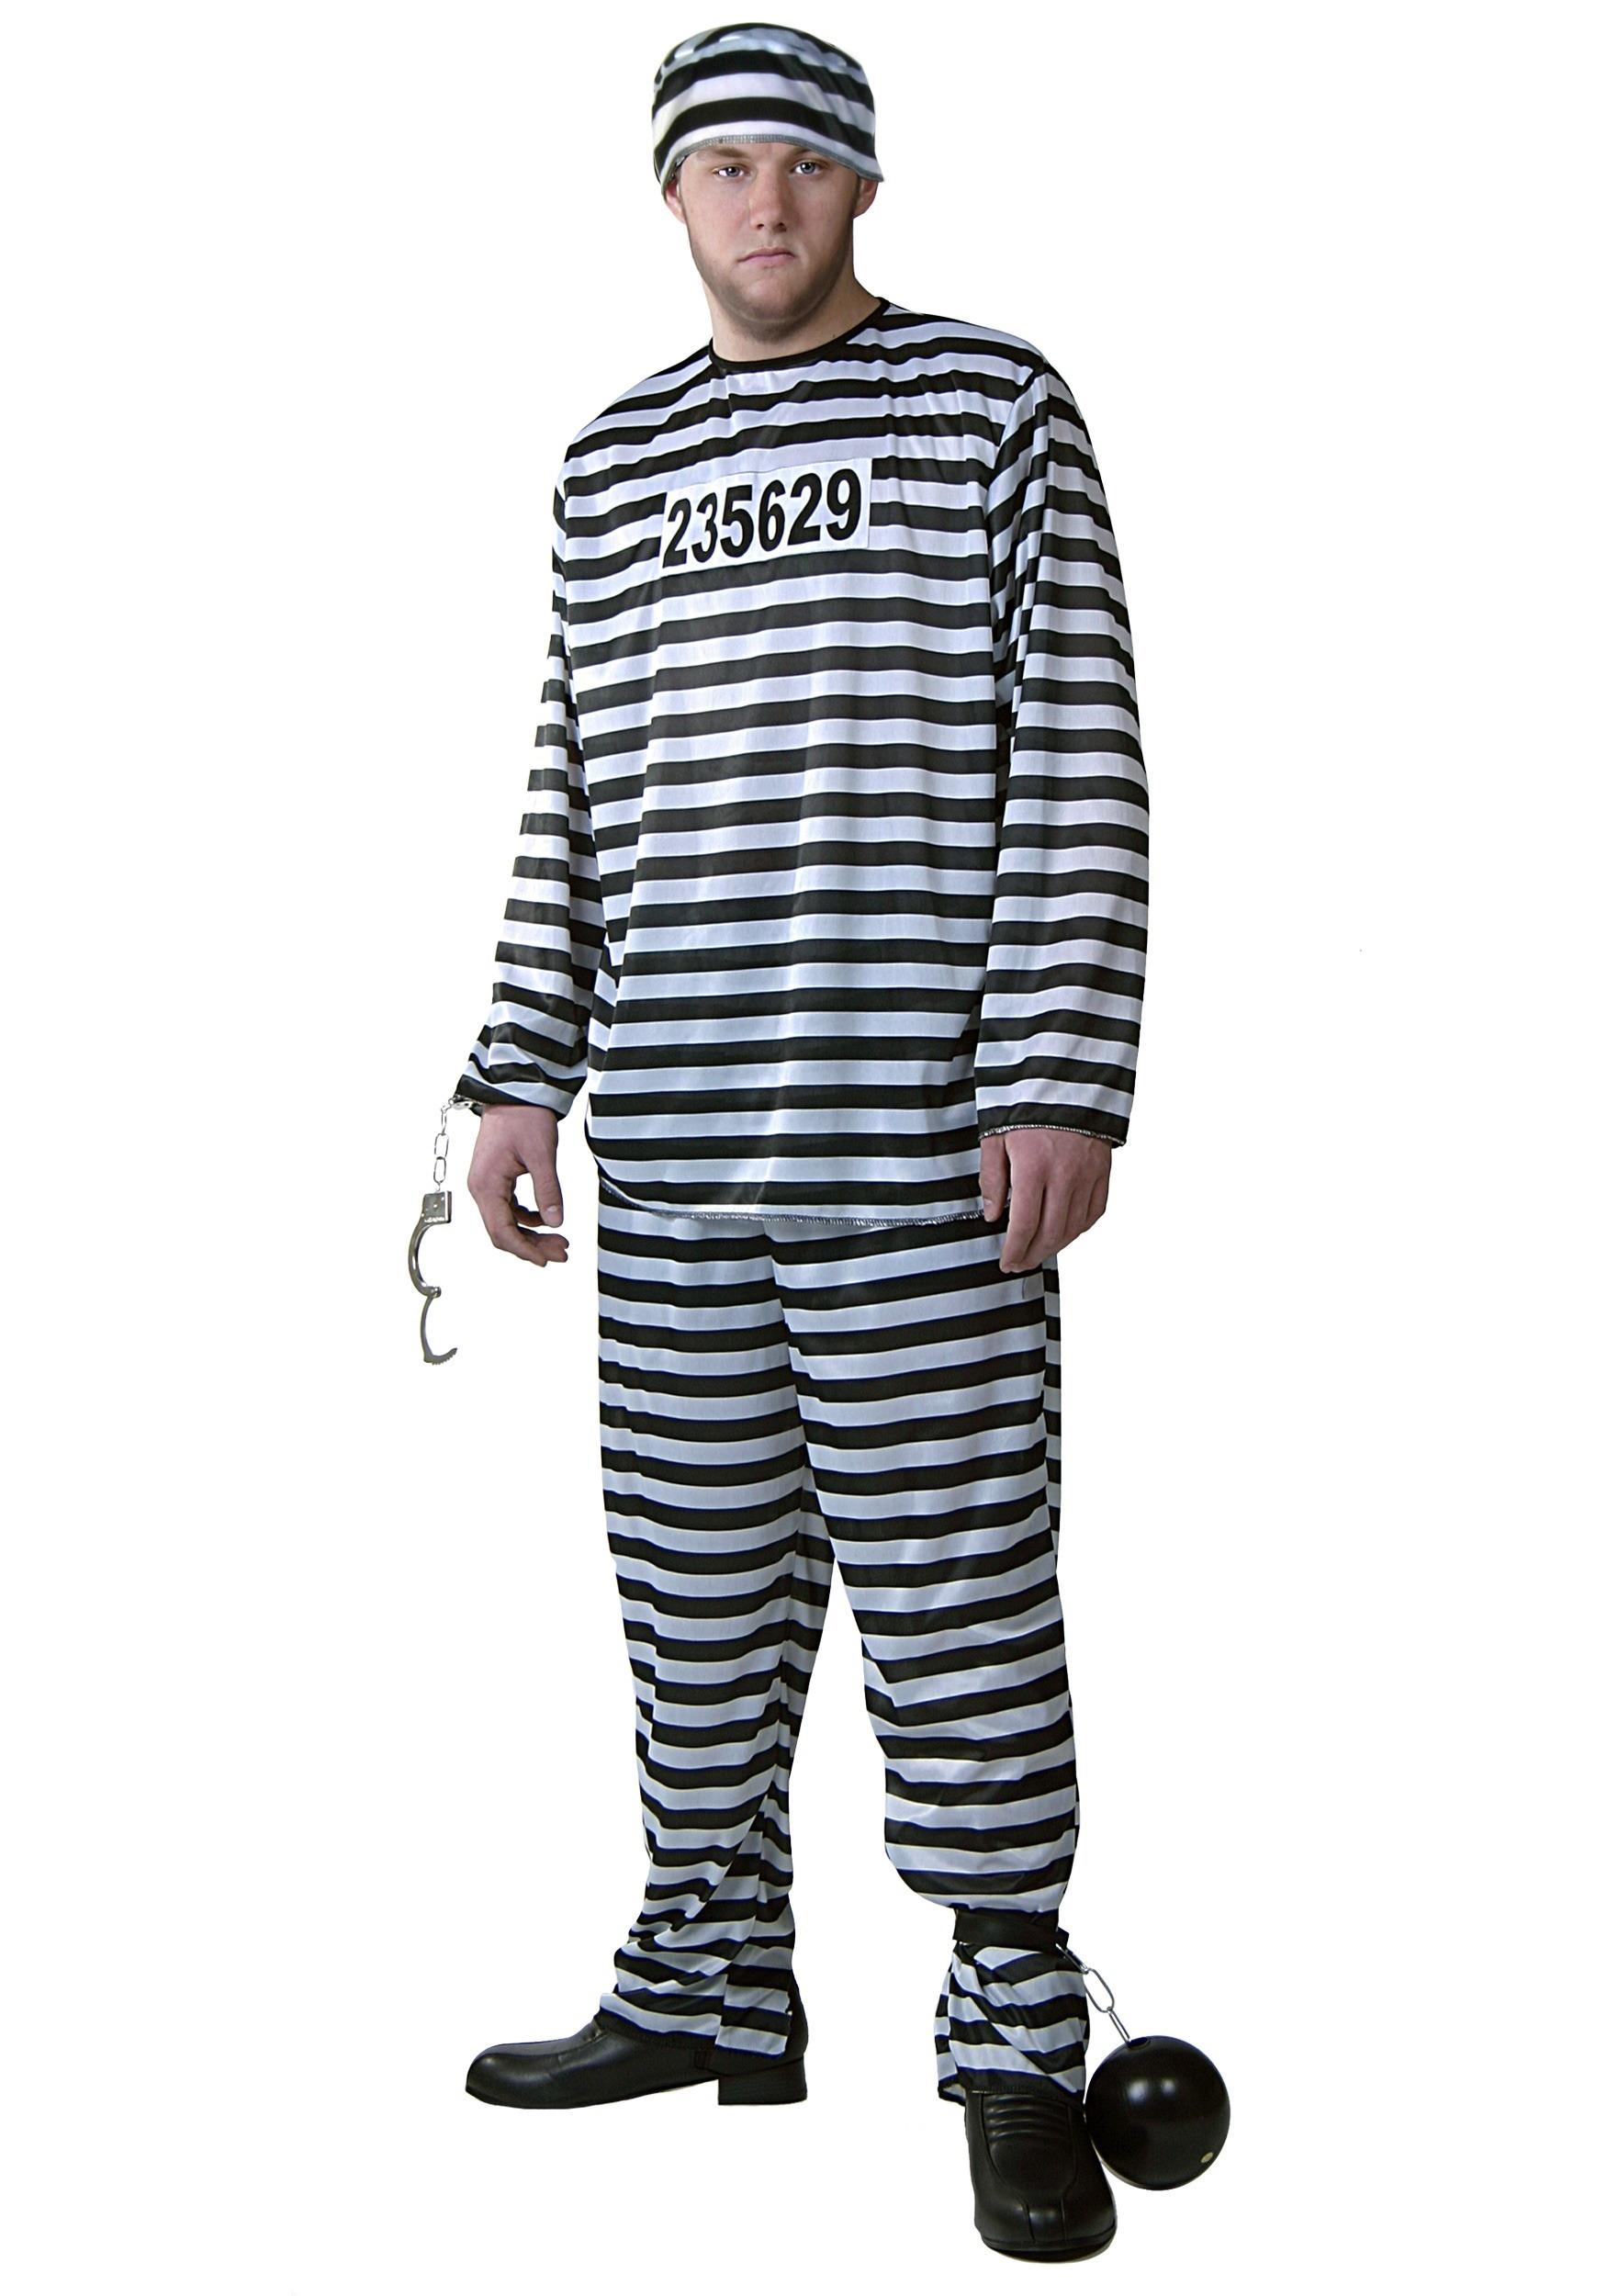 Plus Size Prisoner Costume for Men | Jailbird Halloween Costume